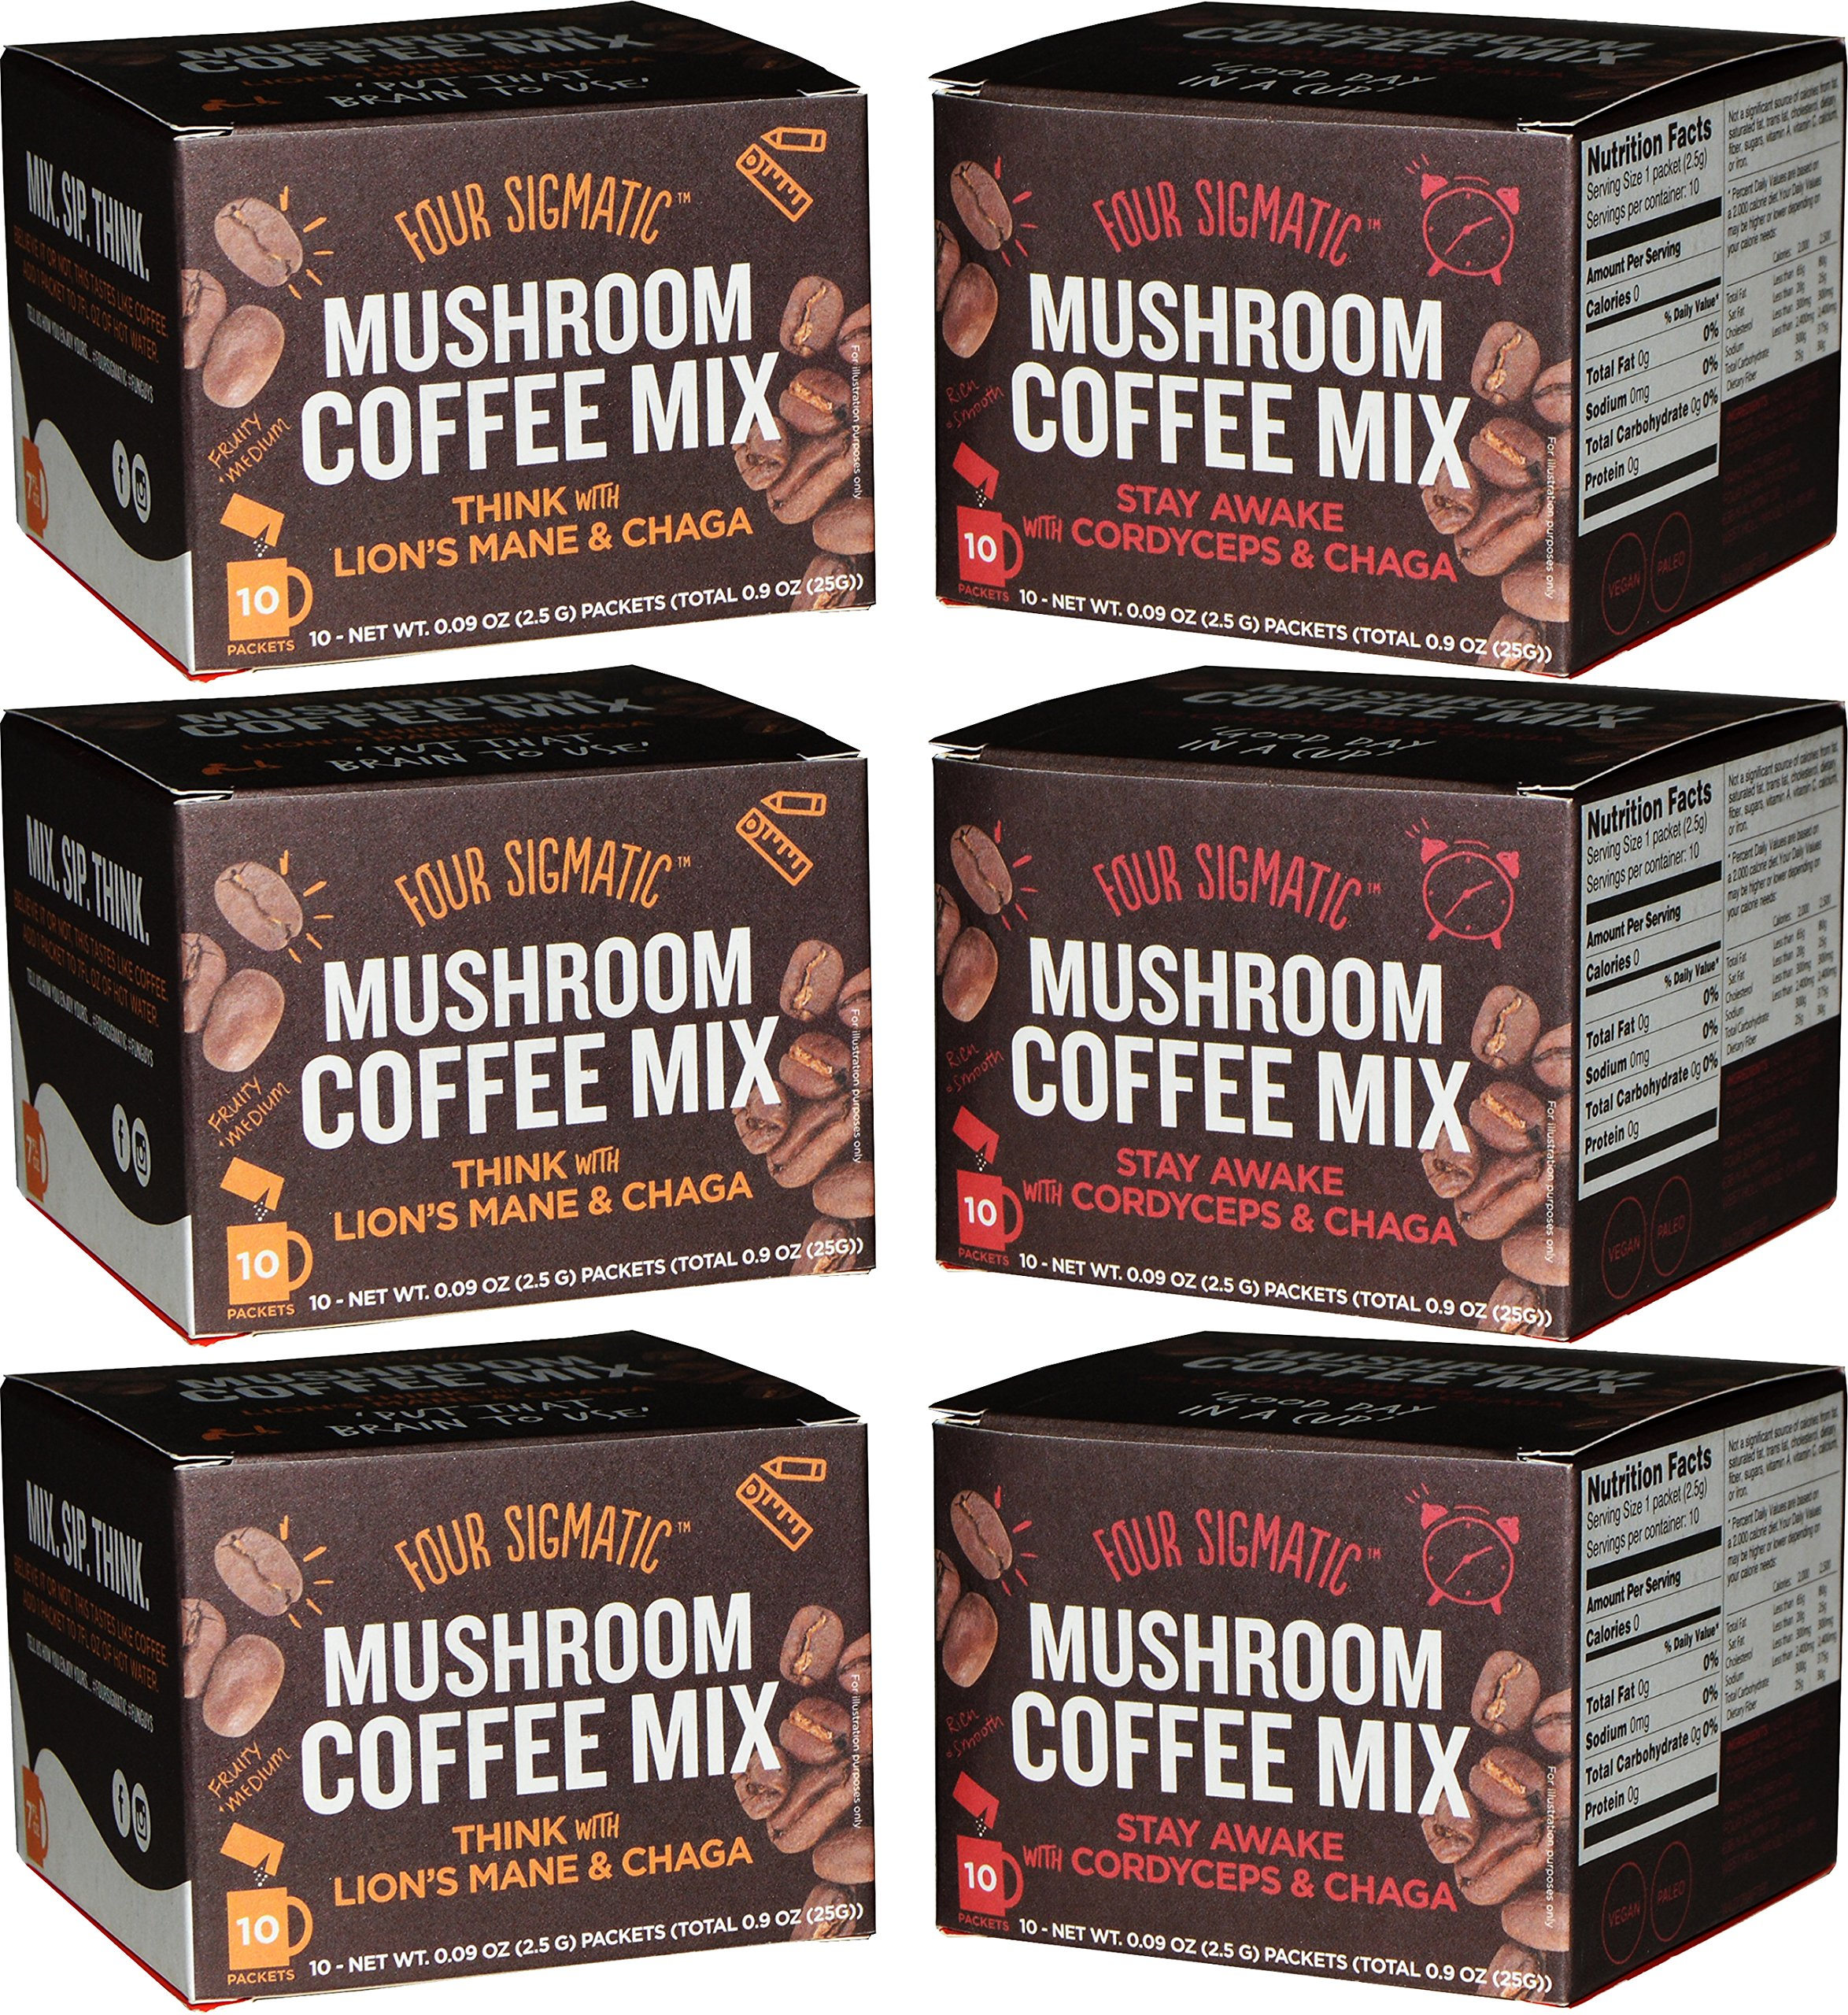 Four Sigmatic Mushroom Coffee Mix Pack of 6 - Lion's Mane and Chaga & Cordyceps and Chaga